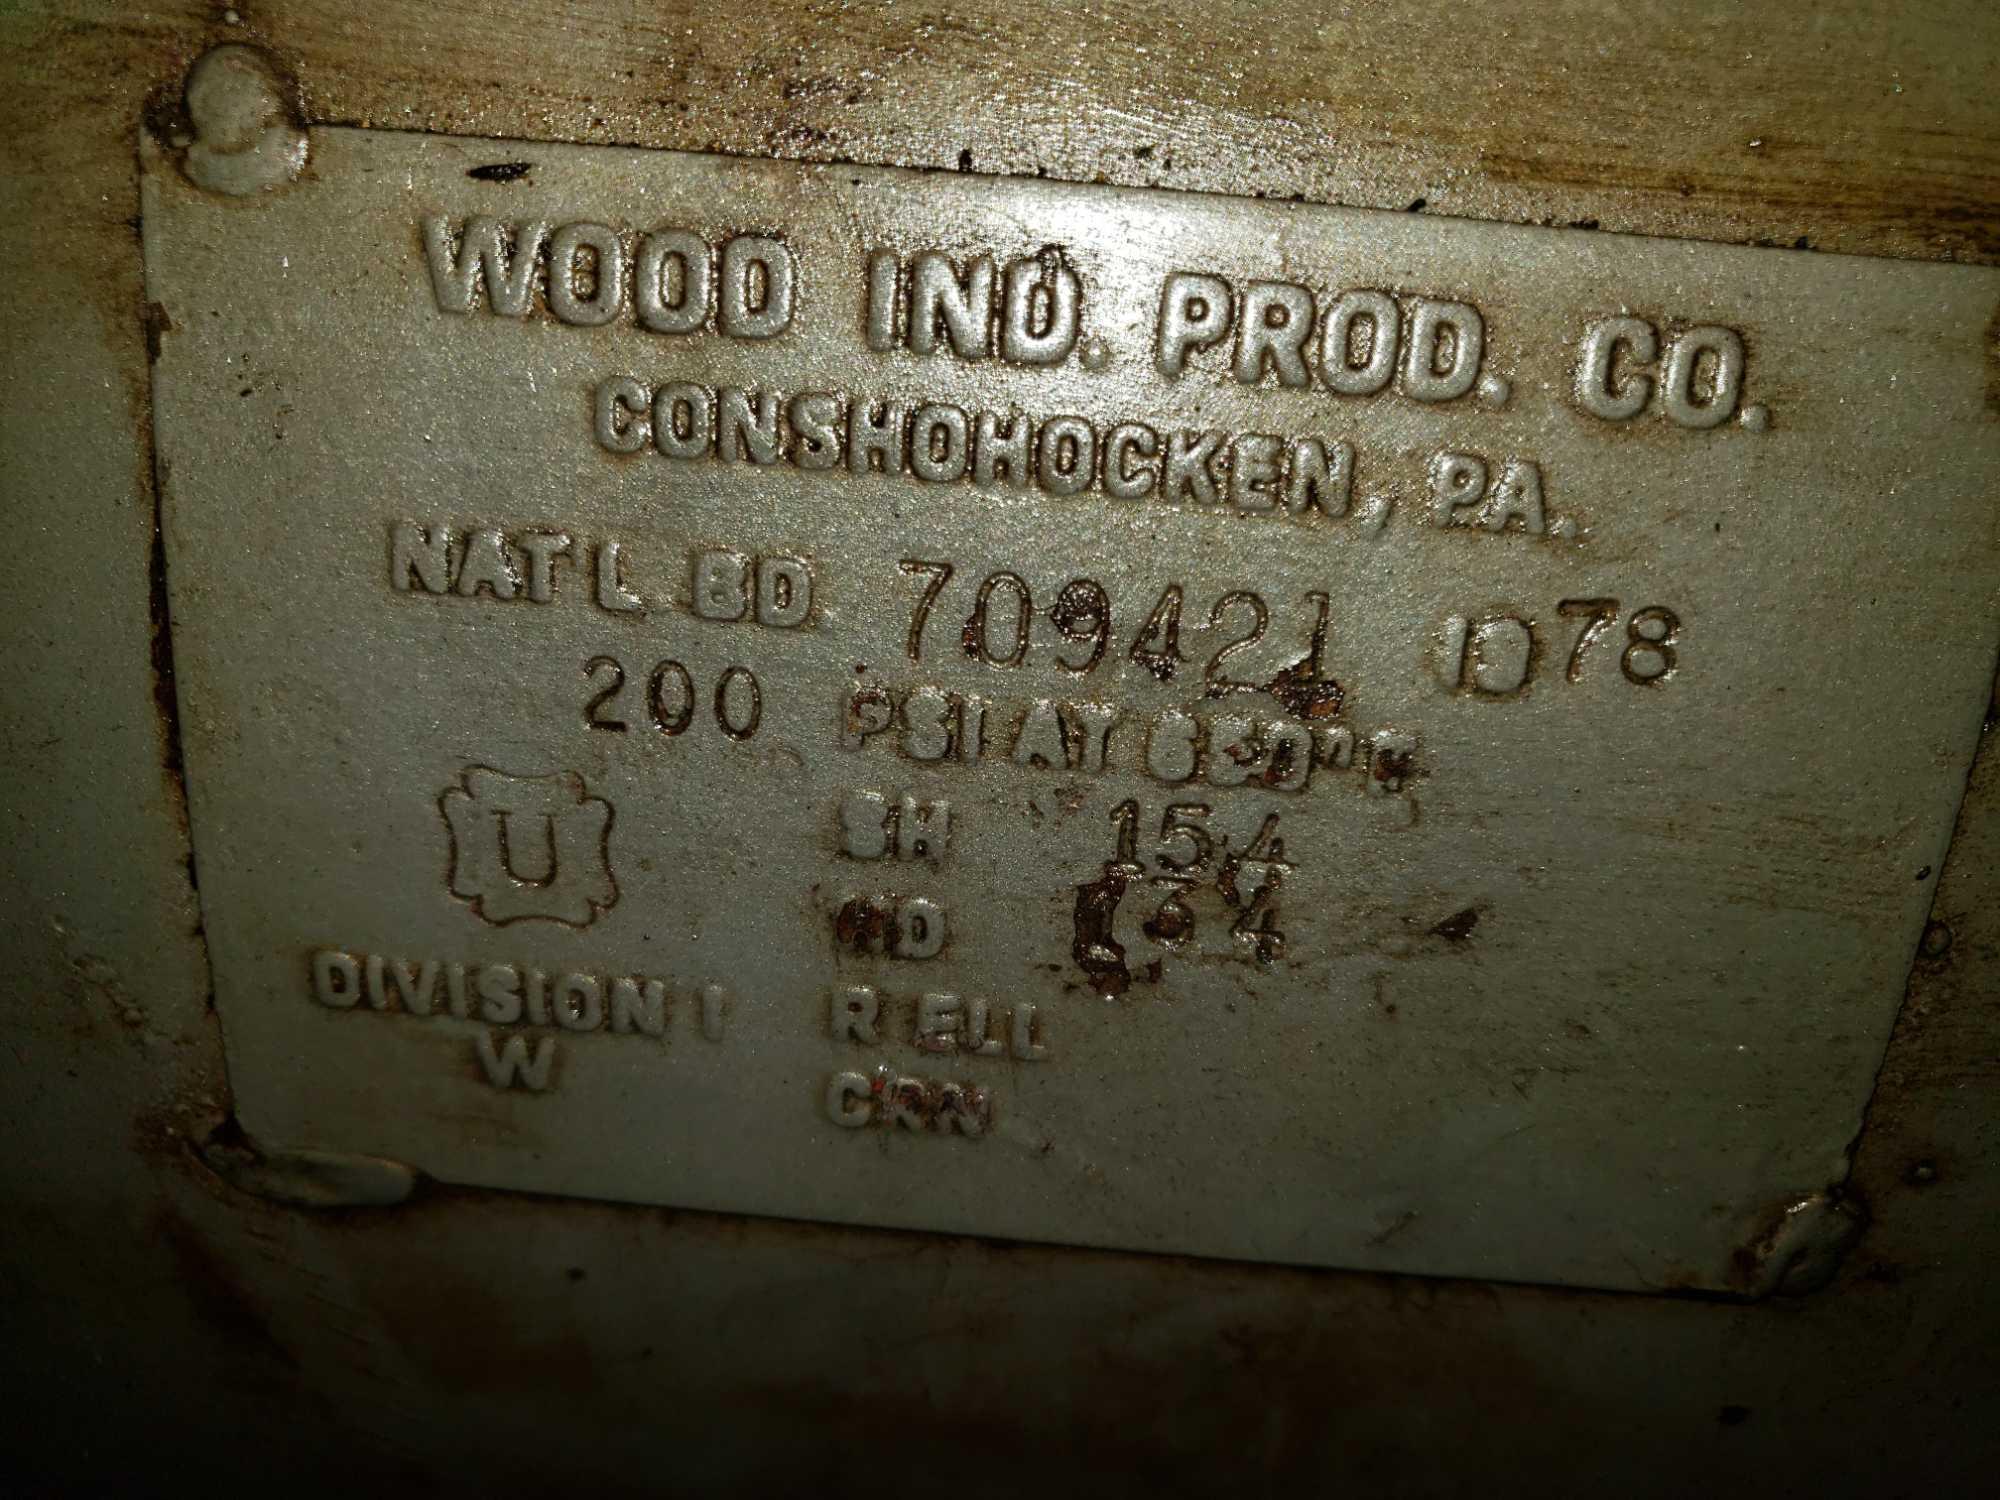 Lot 3 - Worthington 10HP air compressor. 208-230/460v, 3 phase baldor motor